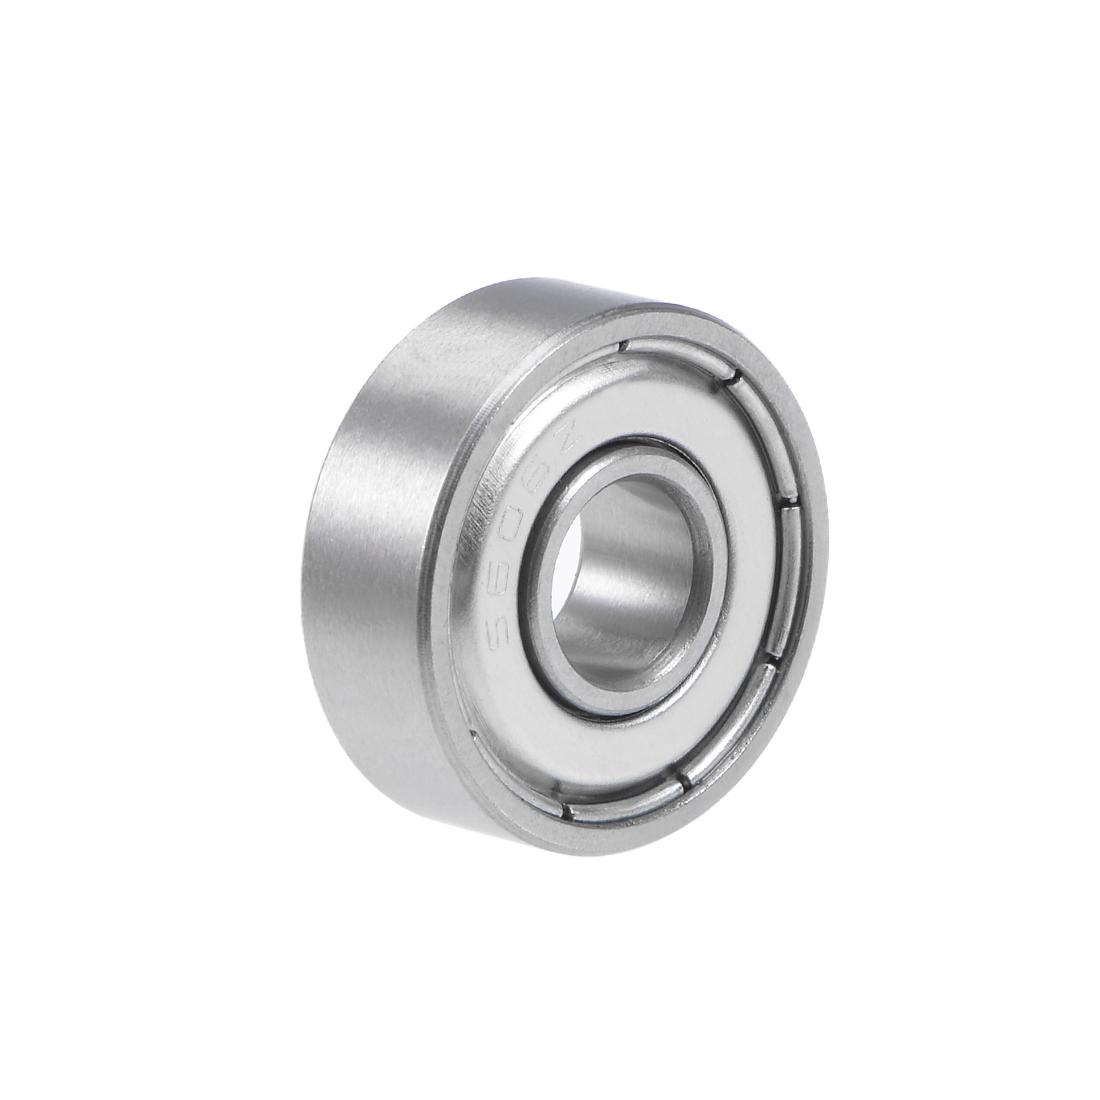 S606ZZ Stainless Steel Ball Bearing 6x17x6mm Double Shielded 606Z Bearings